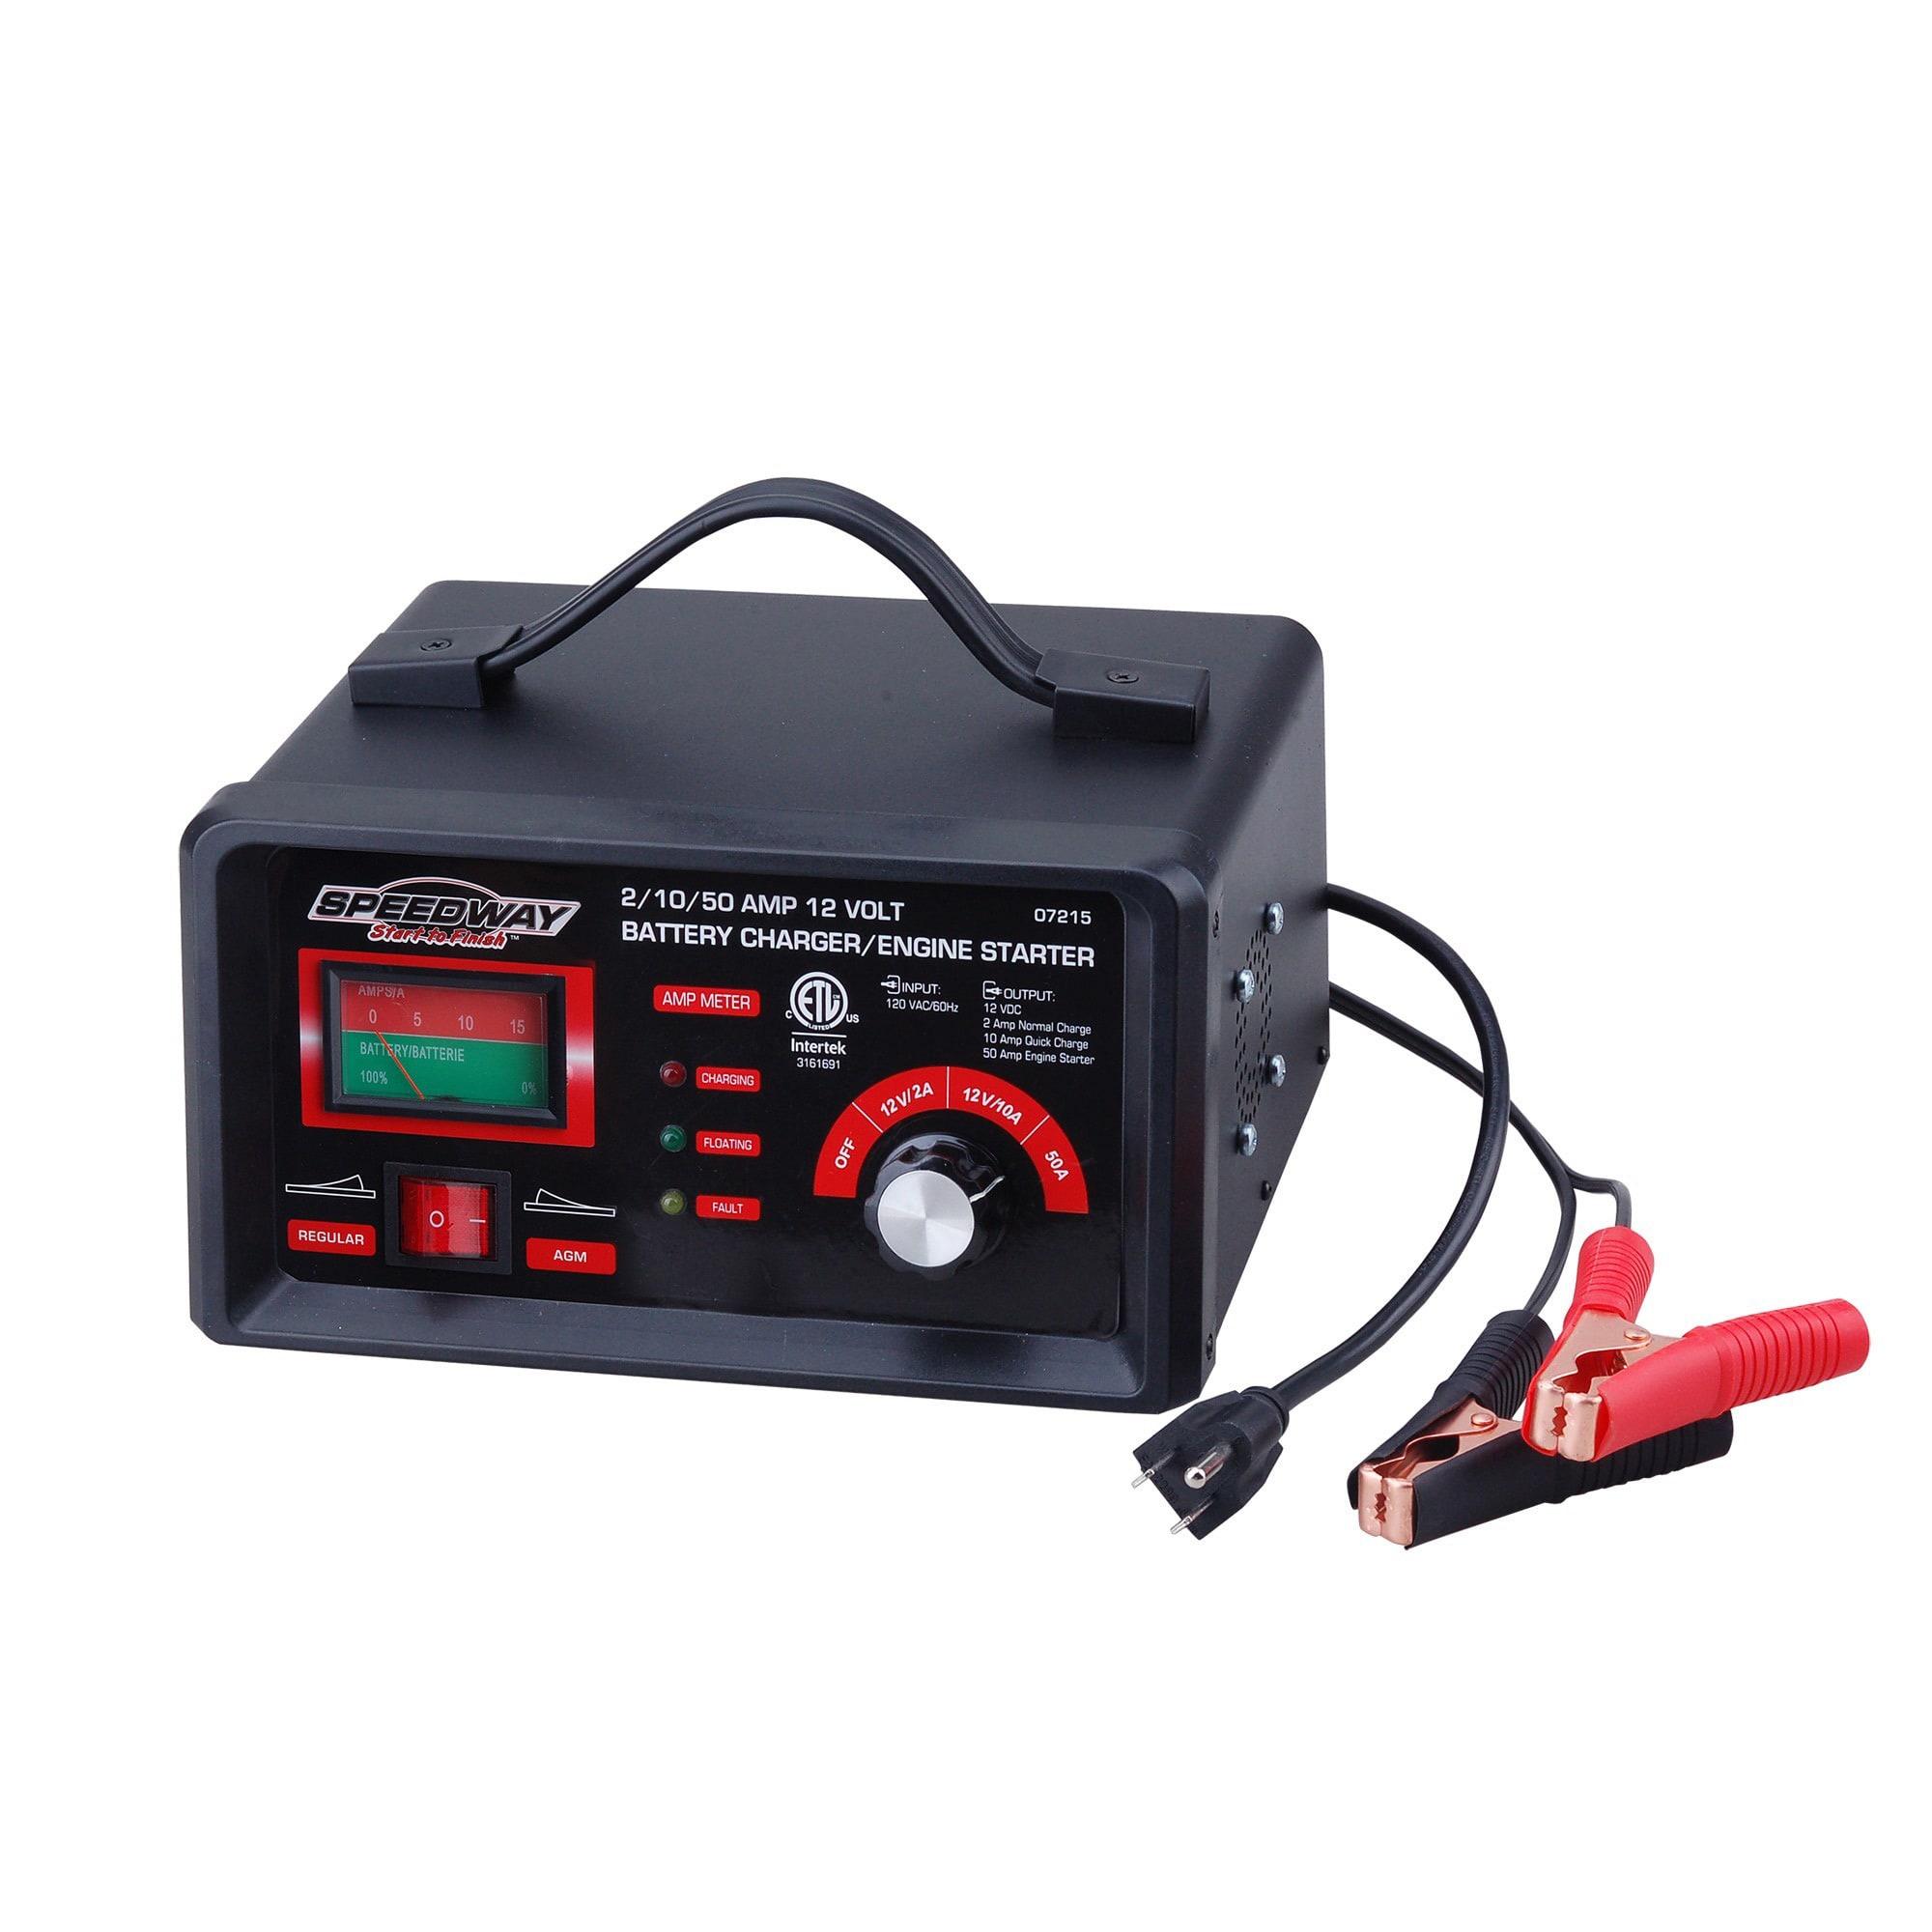 Speedway 2/10/50 AMP 12 Volt Battery Charger/ Engine Starter